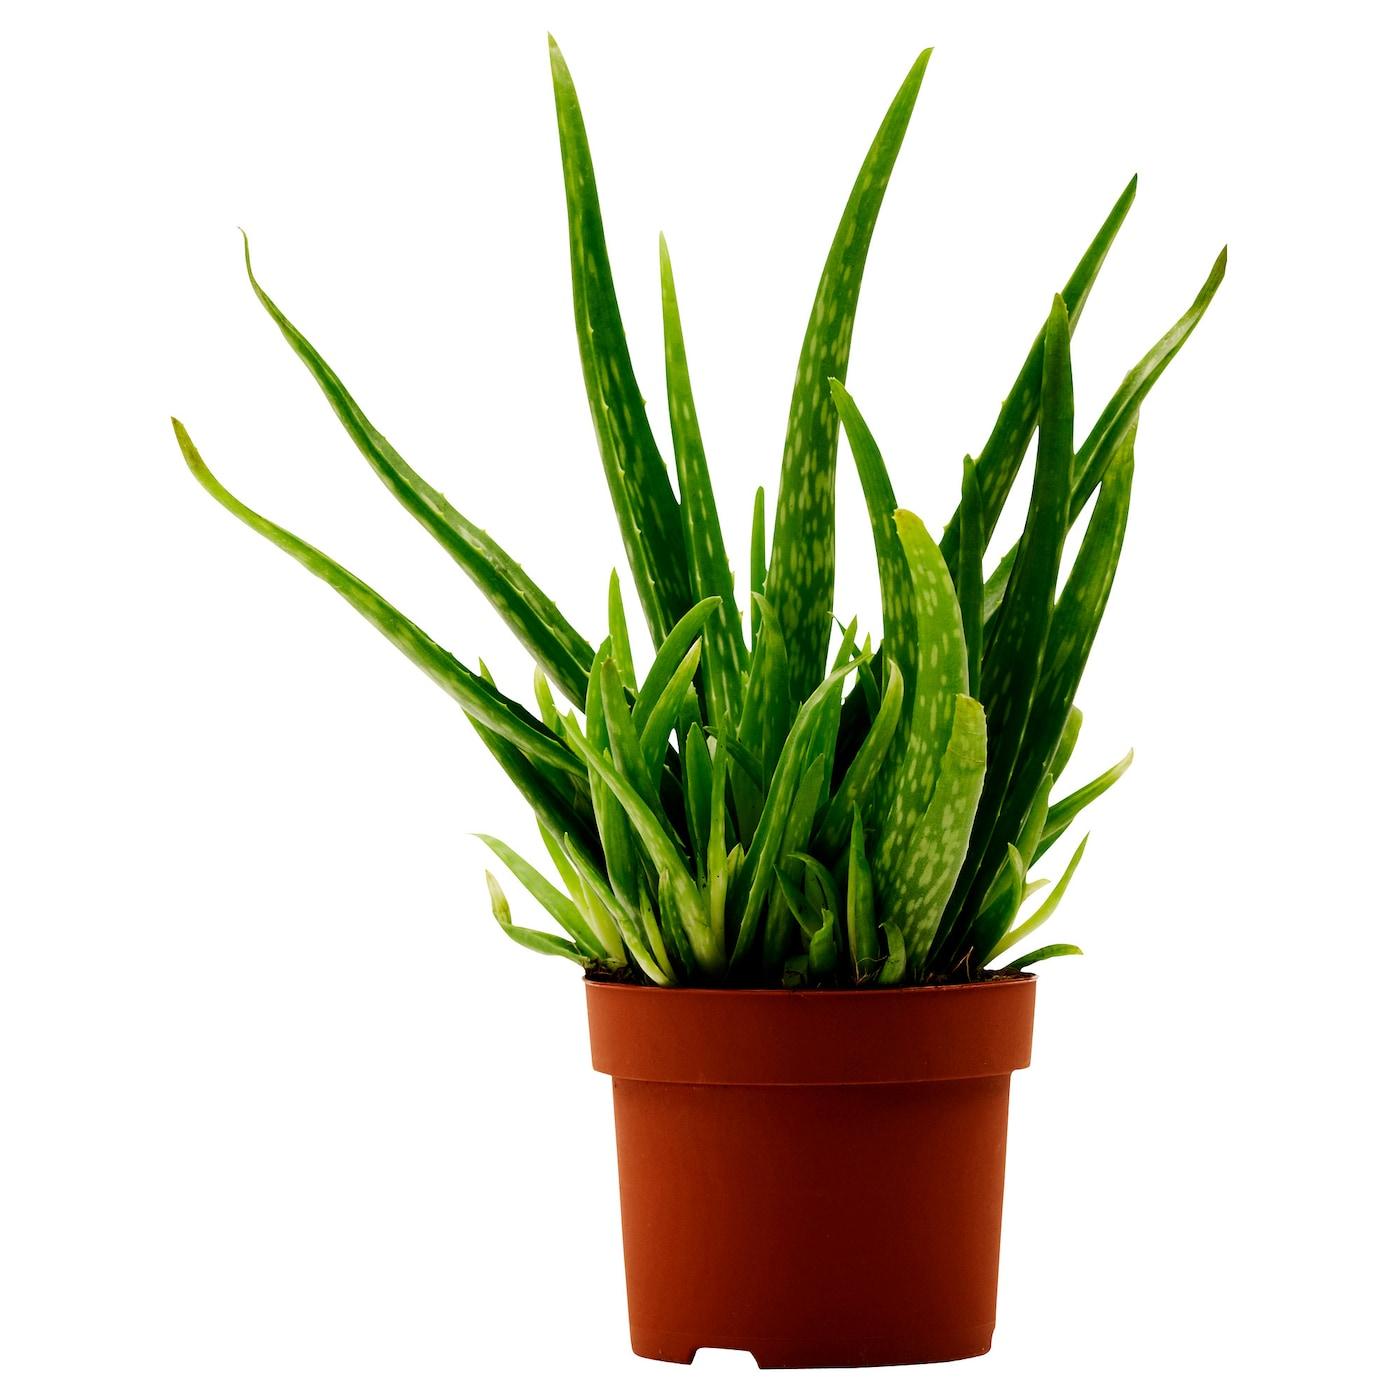 ikea aloe vera potted plant